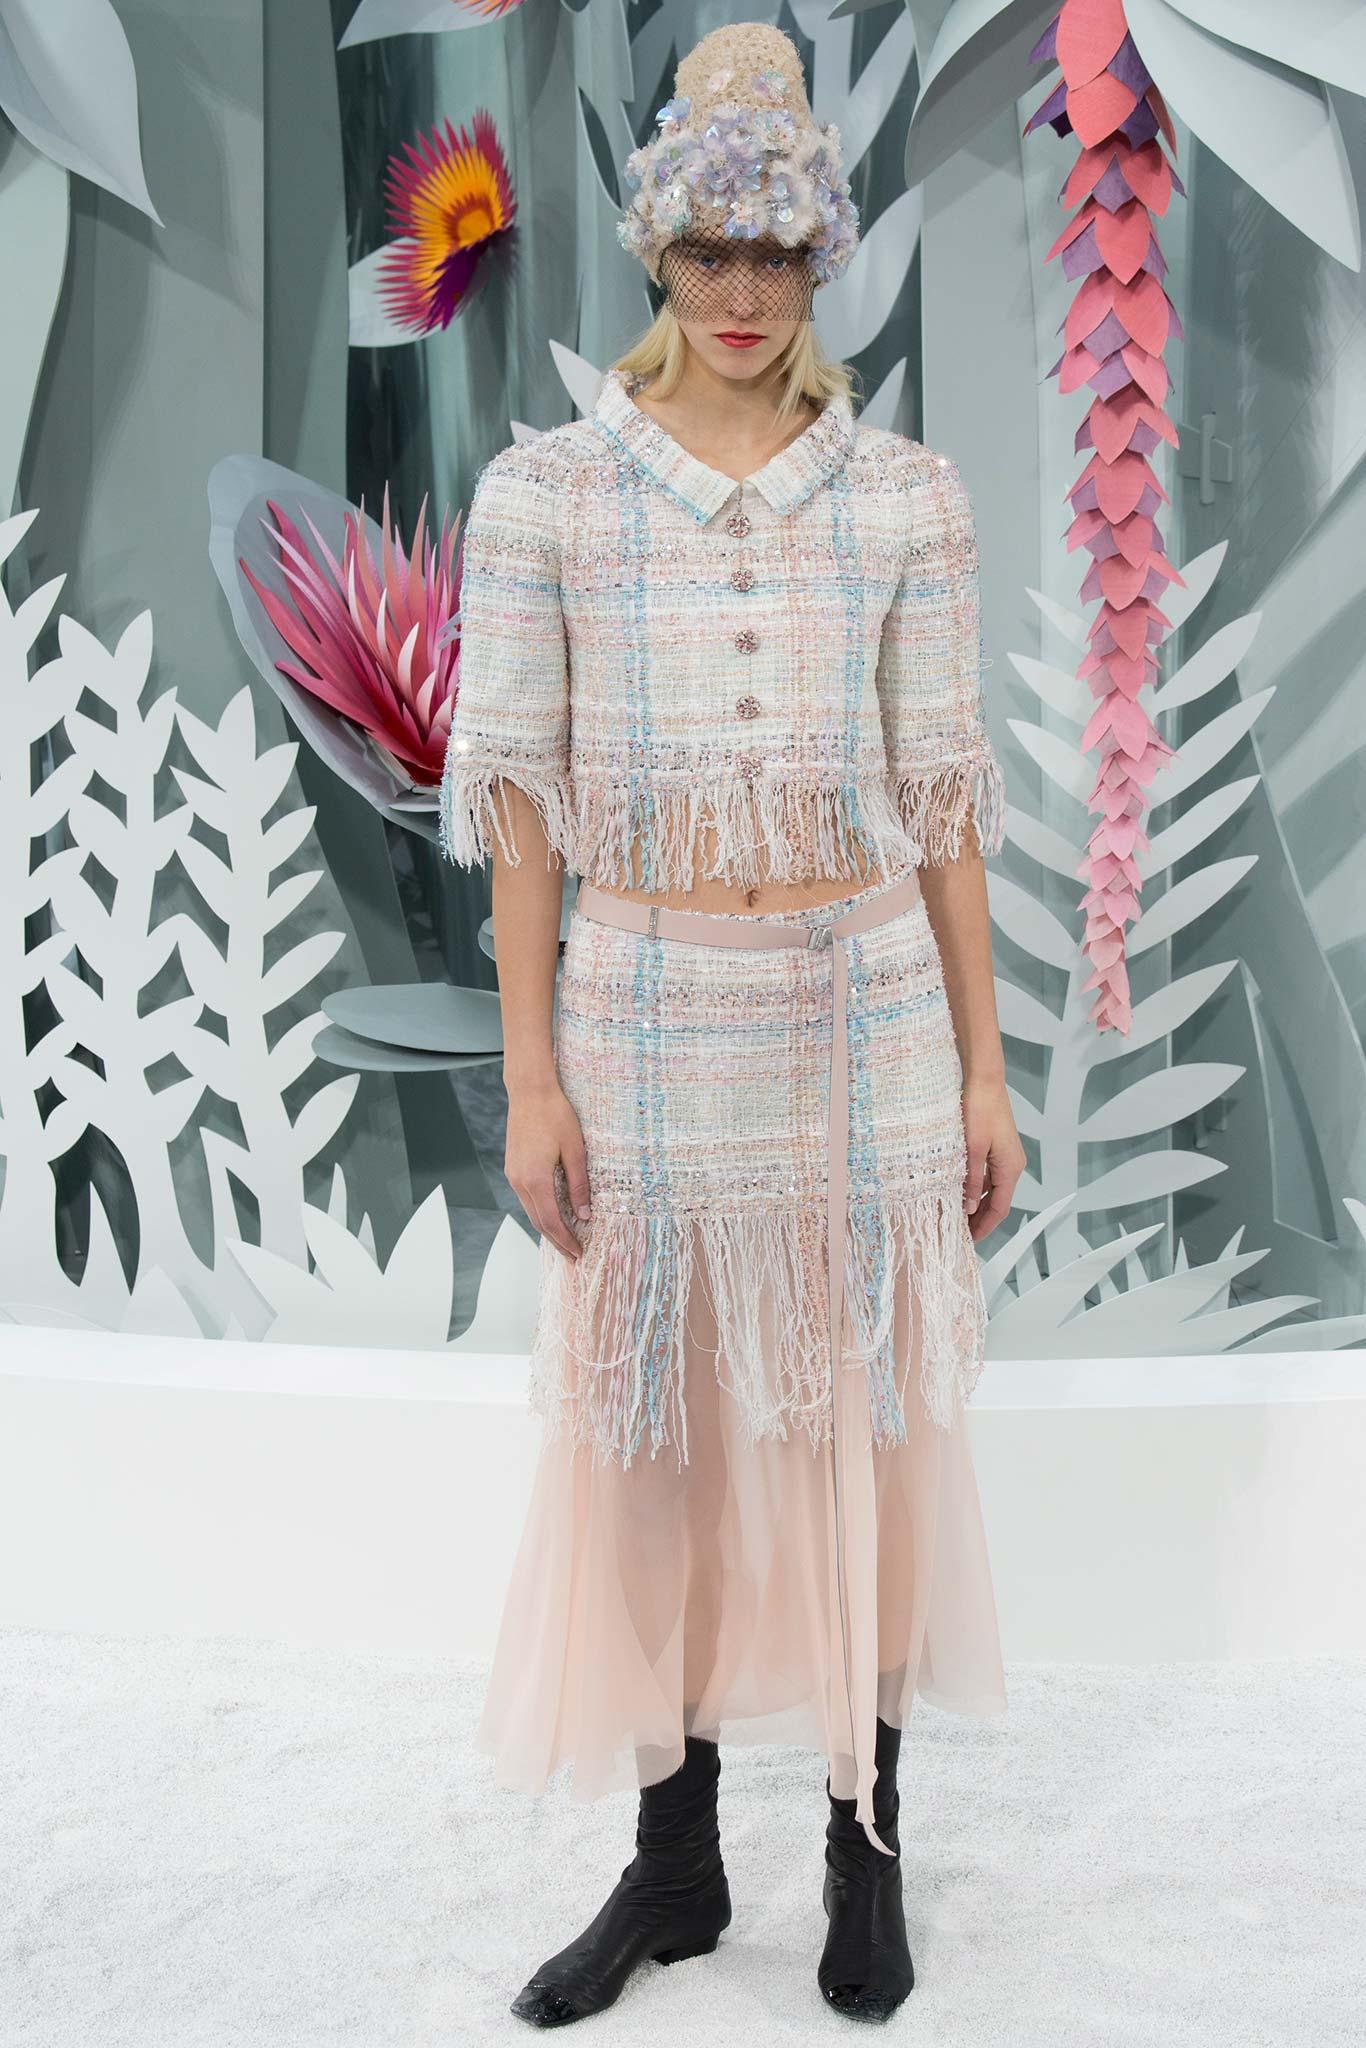 Chanel Haute Couture 2015 2 Самые носибельные образы с Недели моды haute couture в Париже